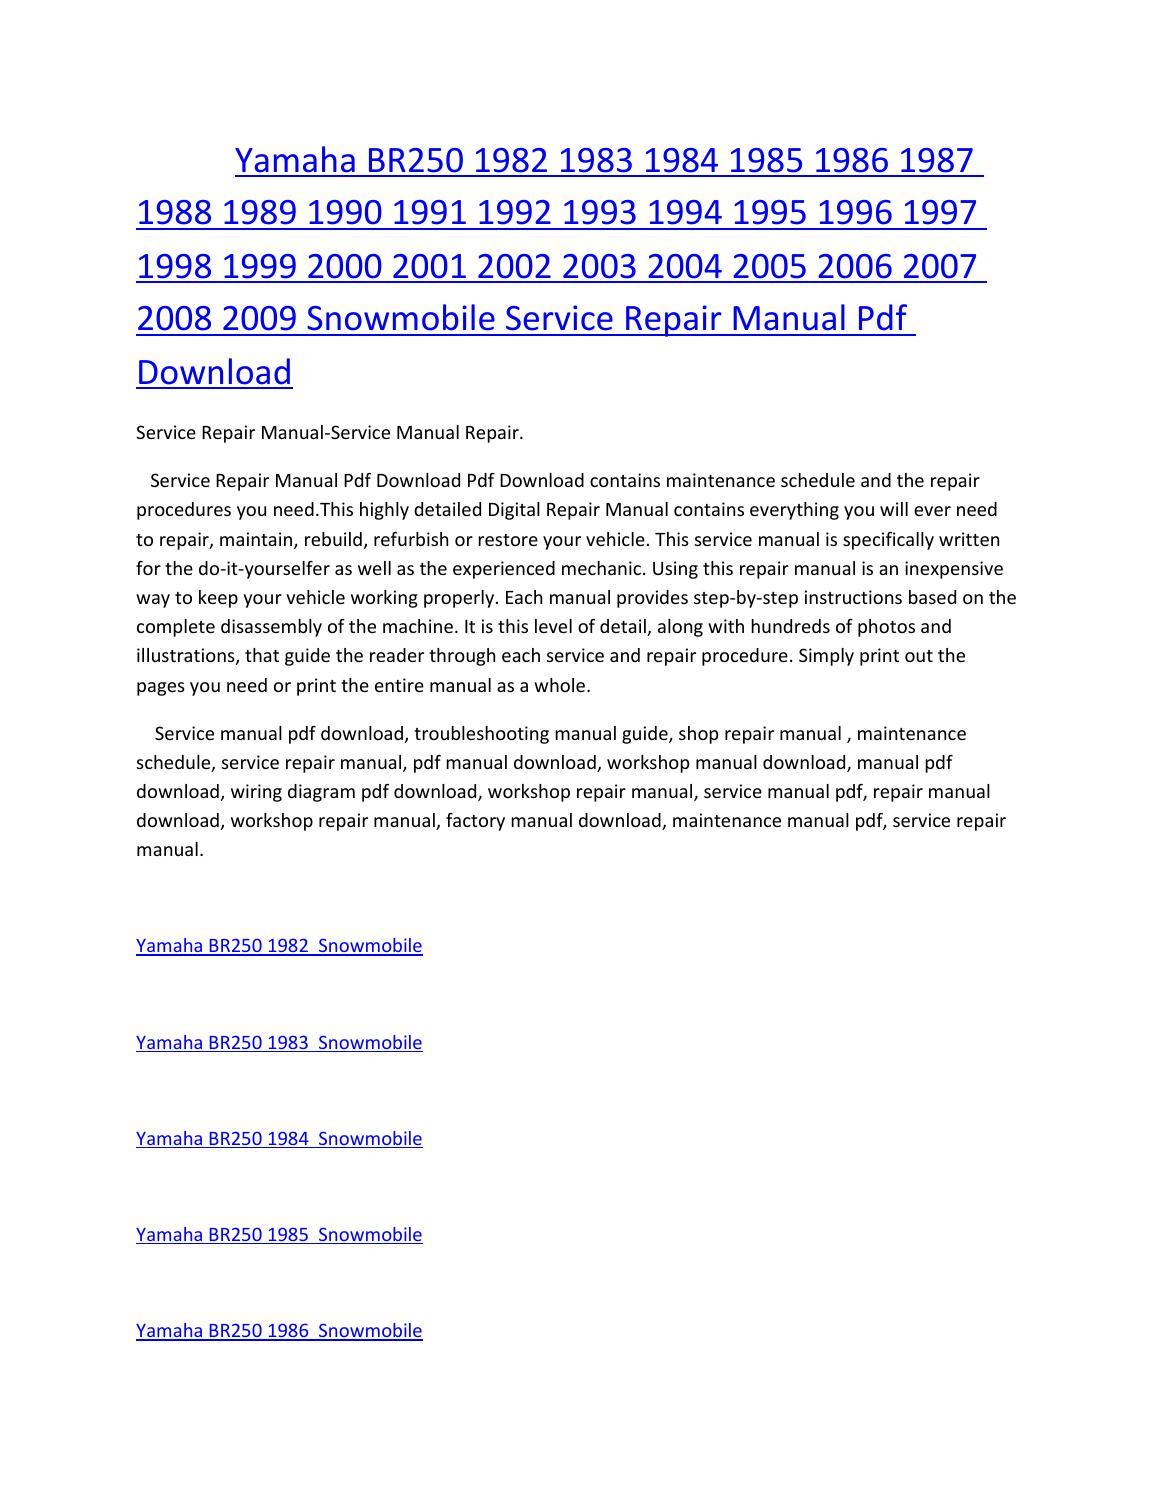 yamaha br250 2009 repair service manual